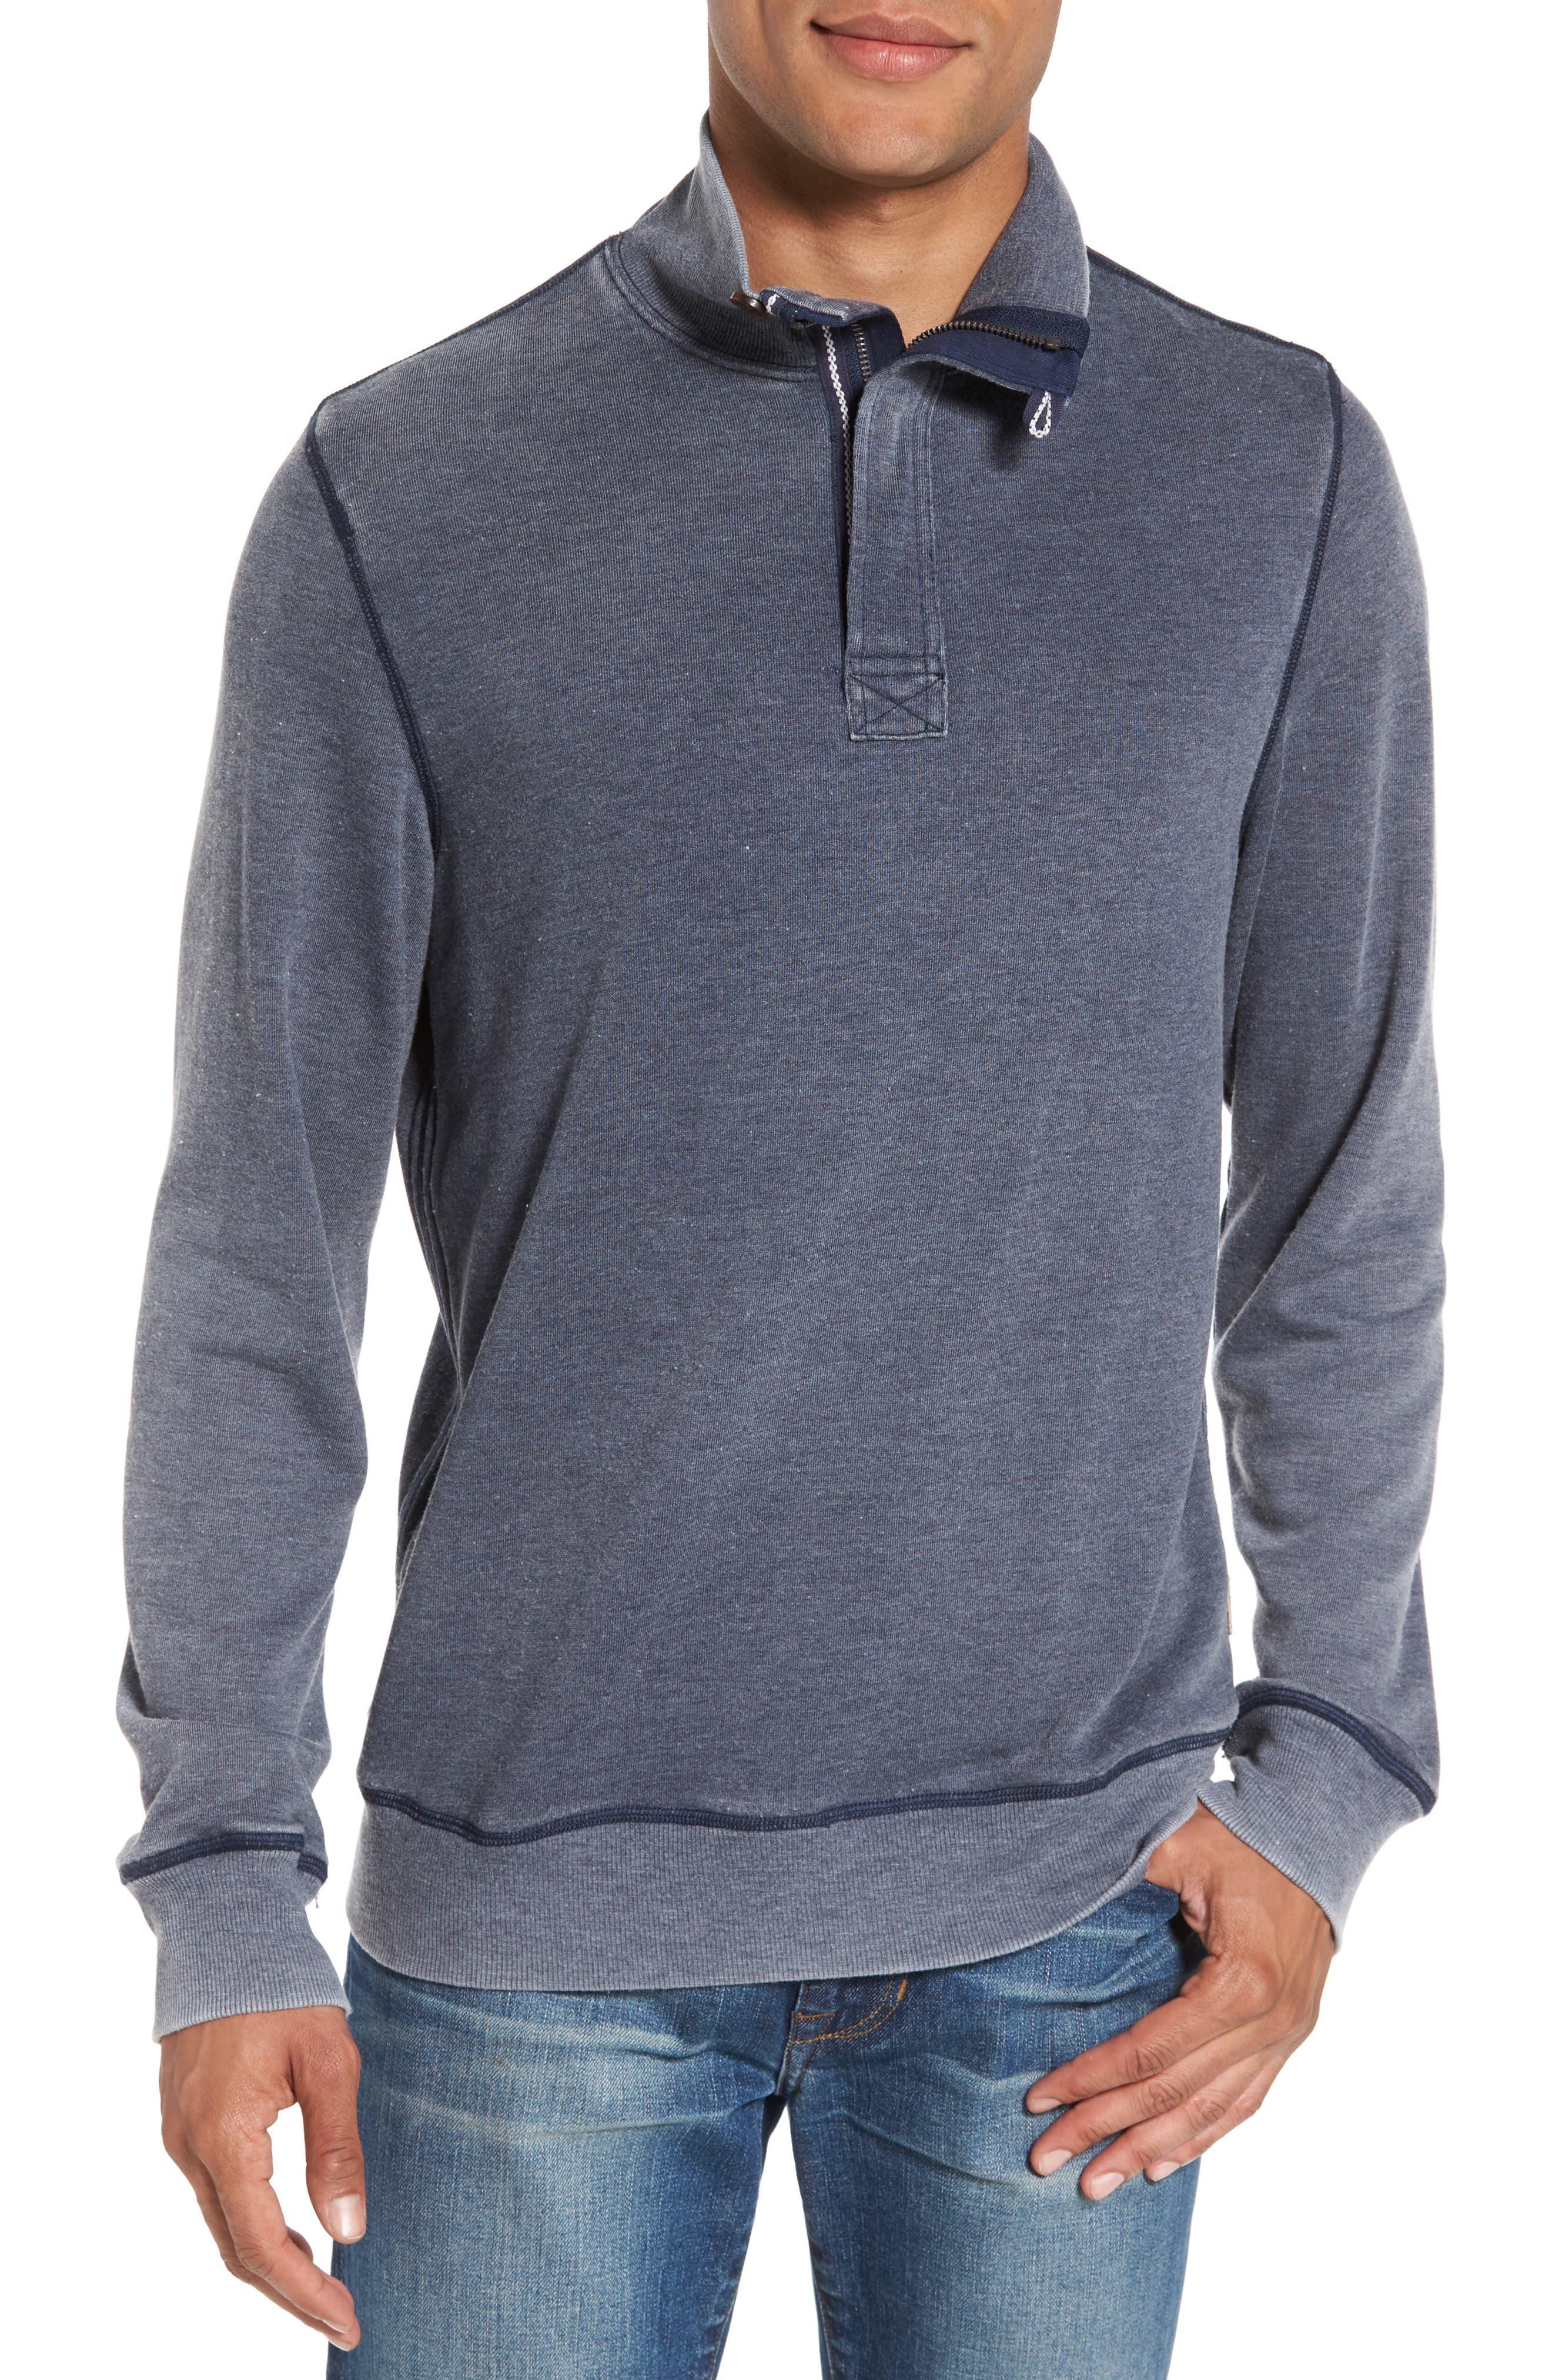 Surfside Supply Burnout Quarter Zip Fleece Pullover